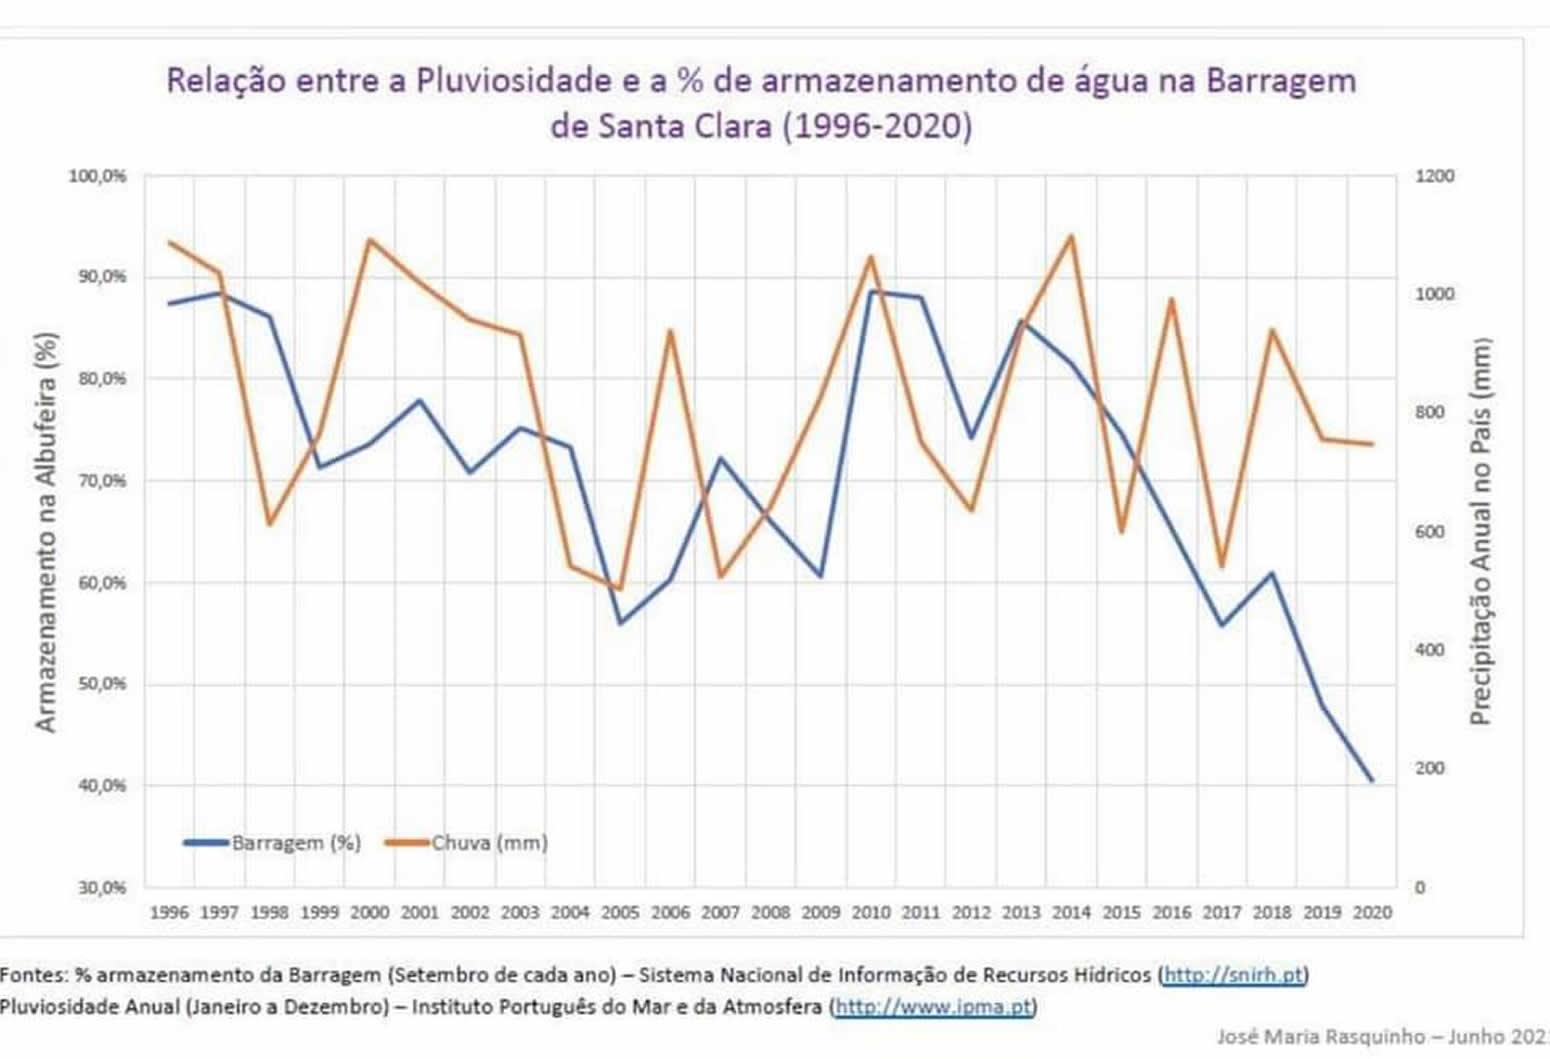 UNSUSTAINABLE WATER MANAGEMENT CONTINUES AT SANTA CLARA DAM